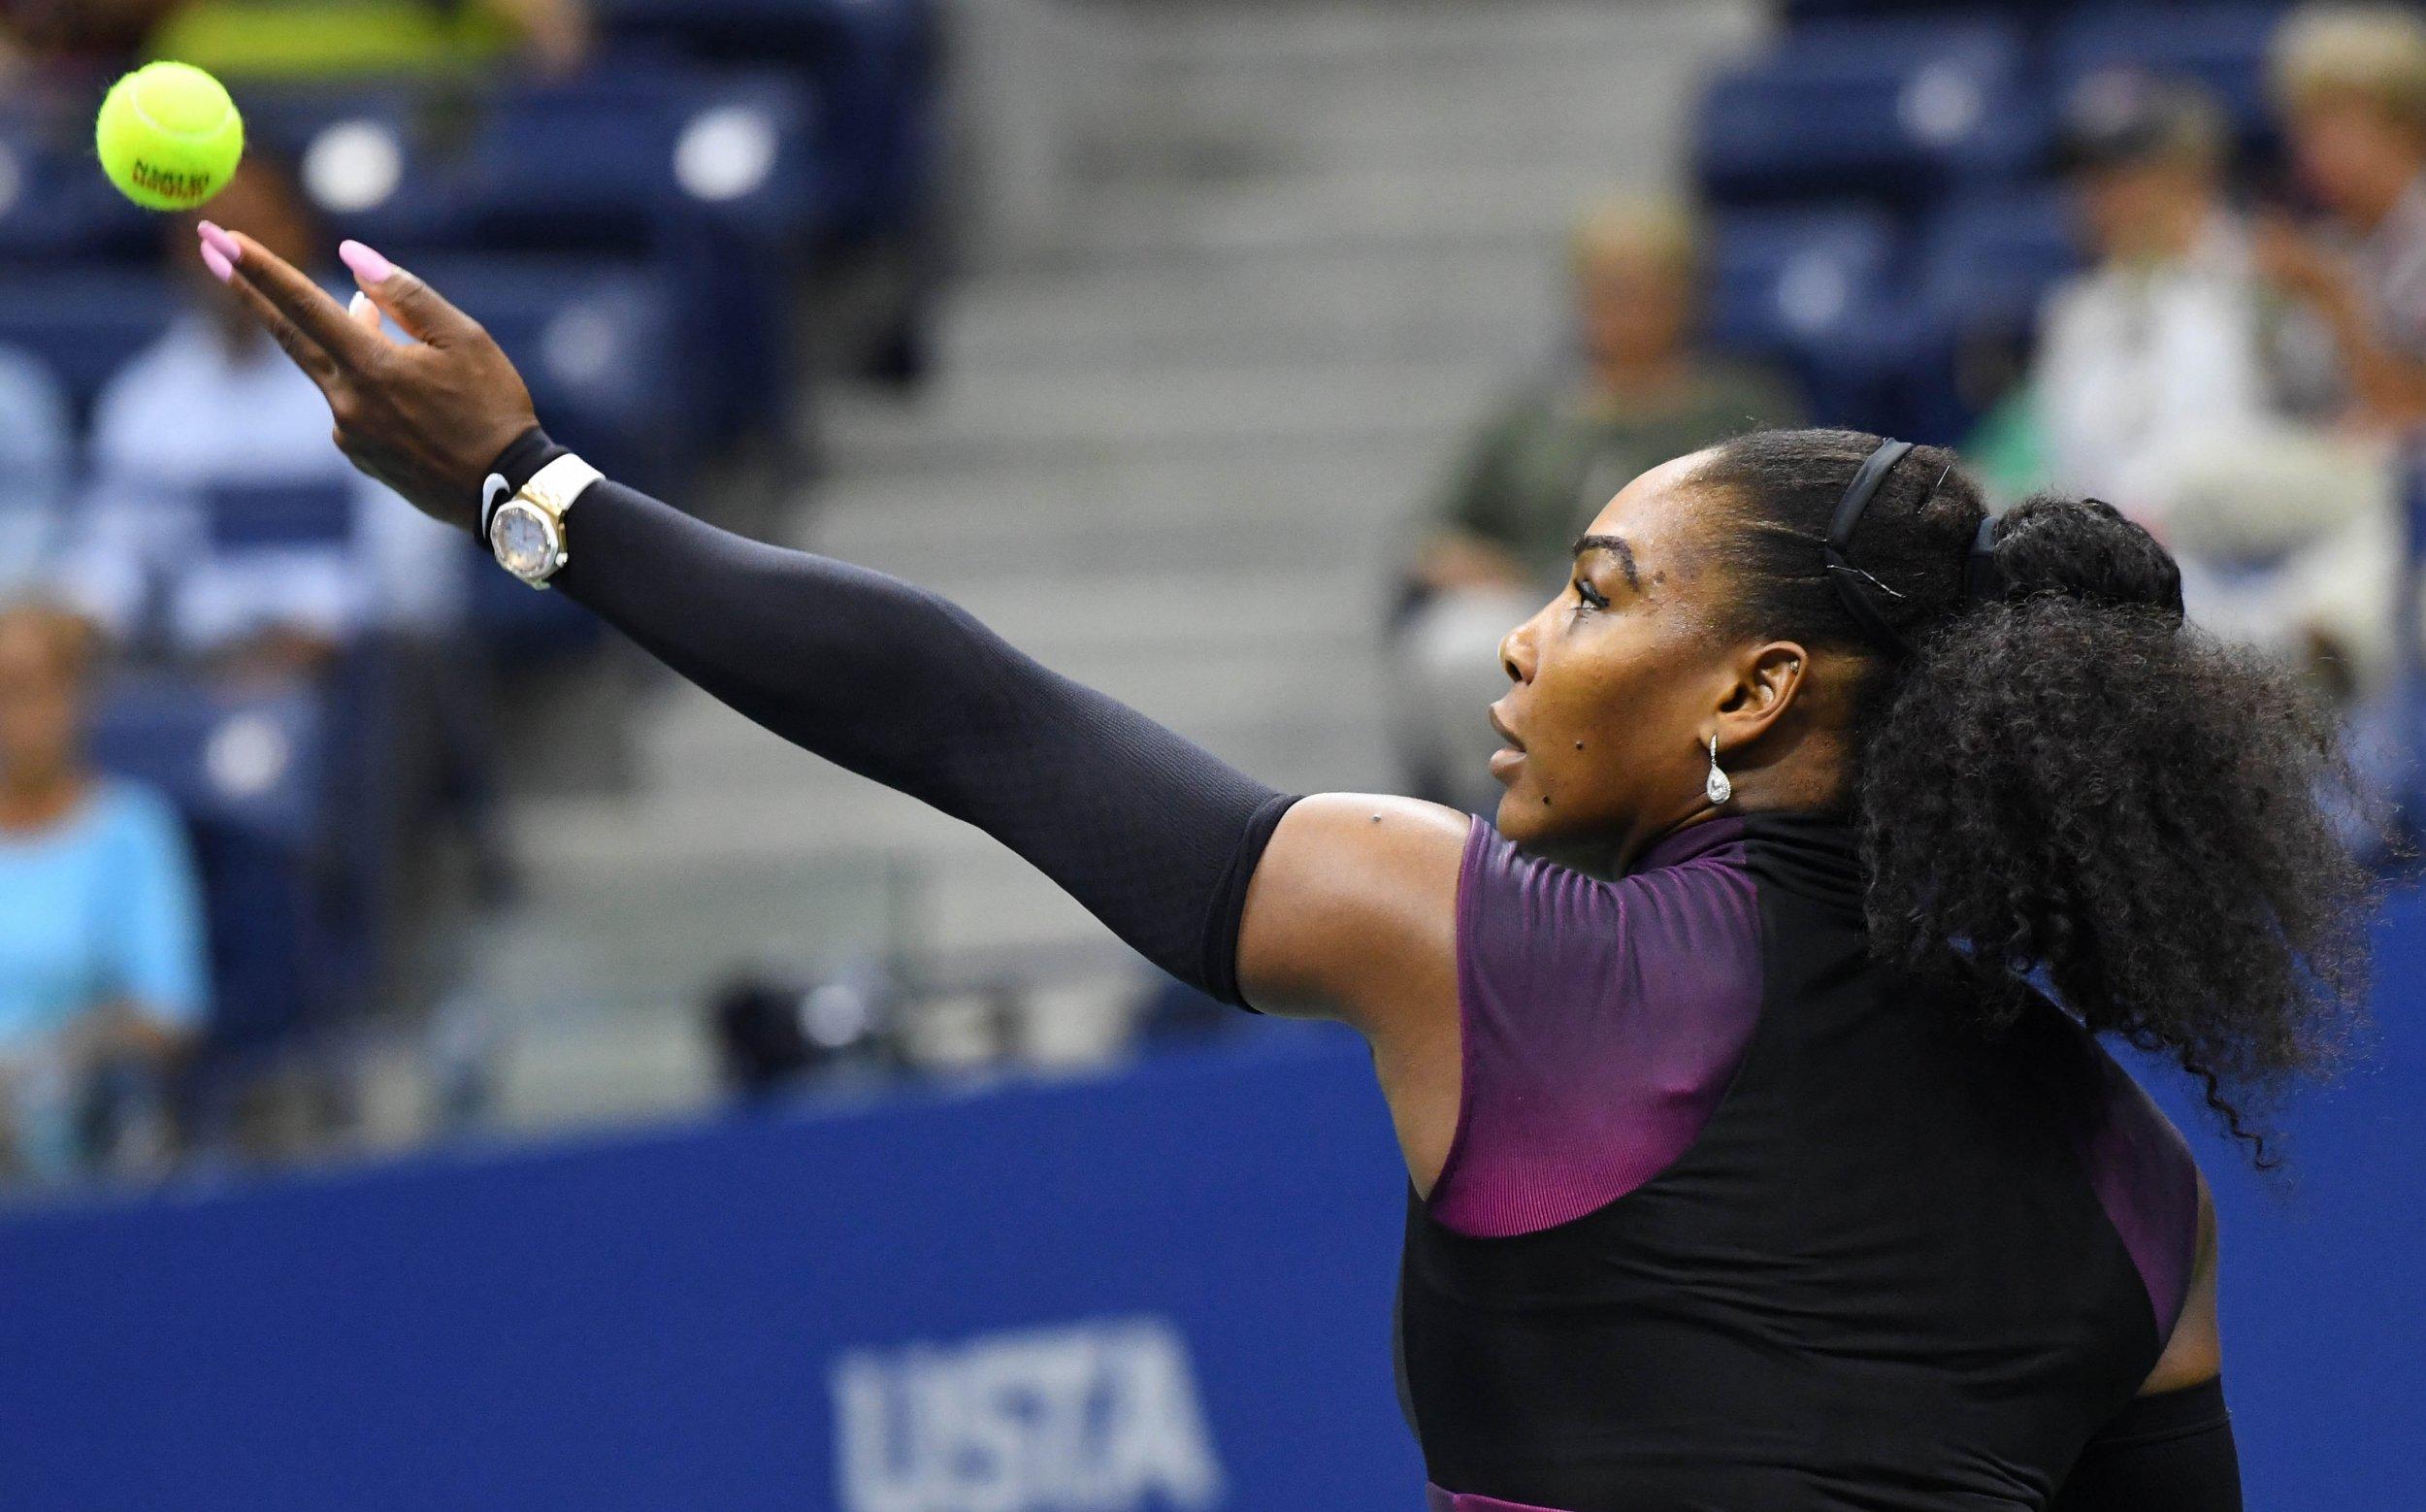 9-23-16 Serena Williams